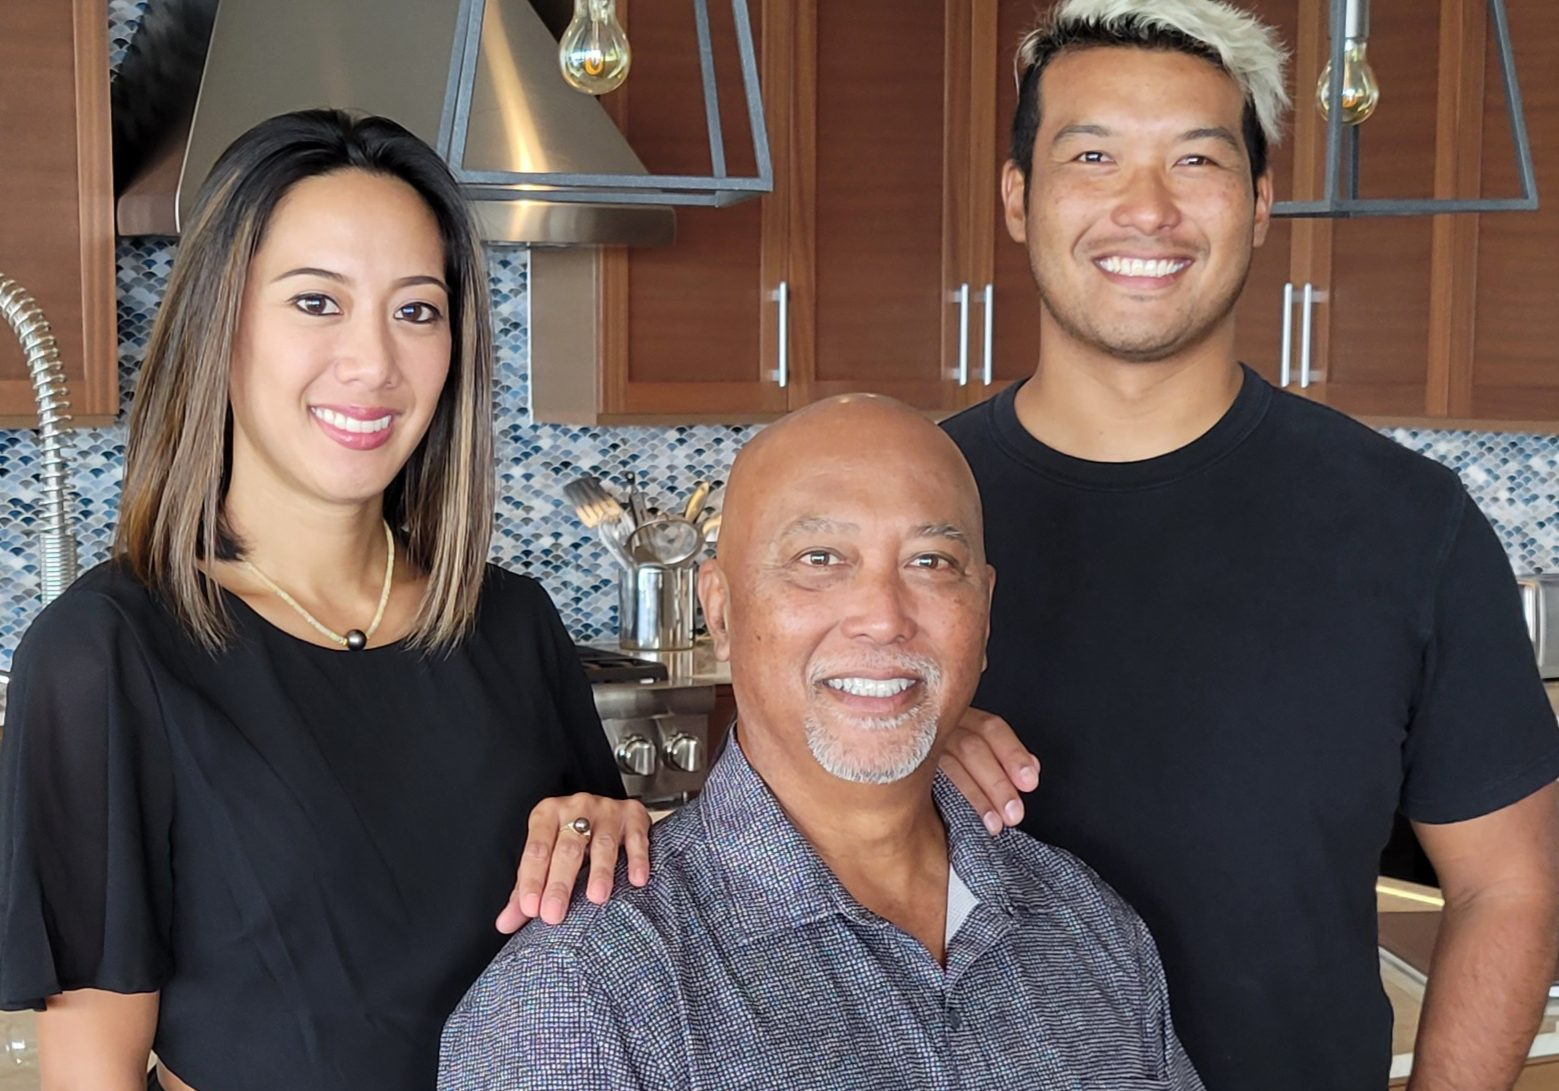 Team Mira - Tim, Nagel & Cory Kauai Realtors